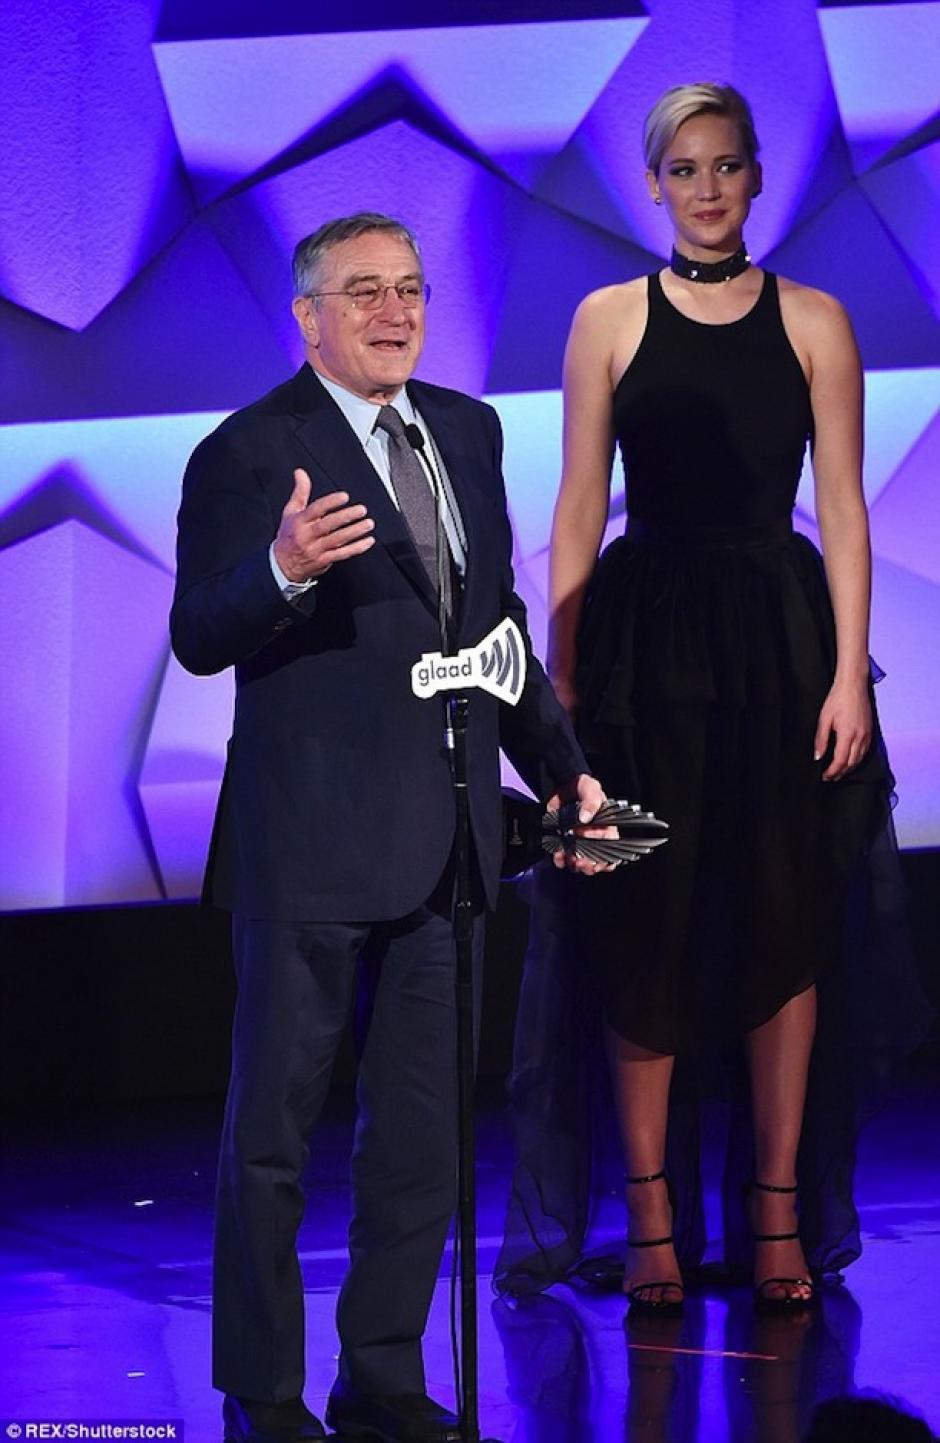 Jennifer presentó a Robert DeNiro en la gala. (Foto: Mail Online)